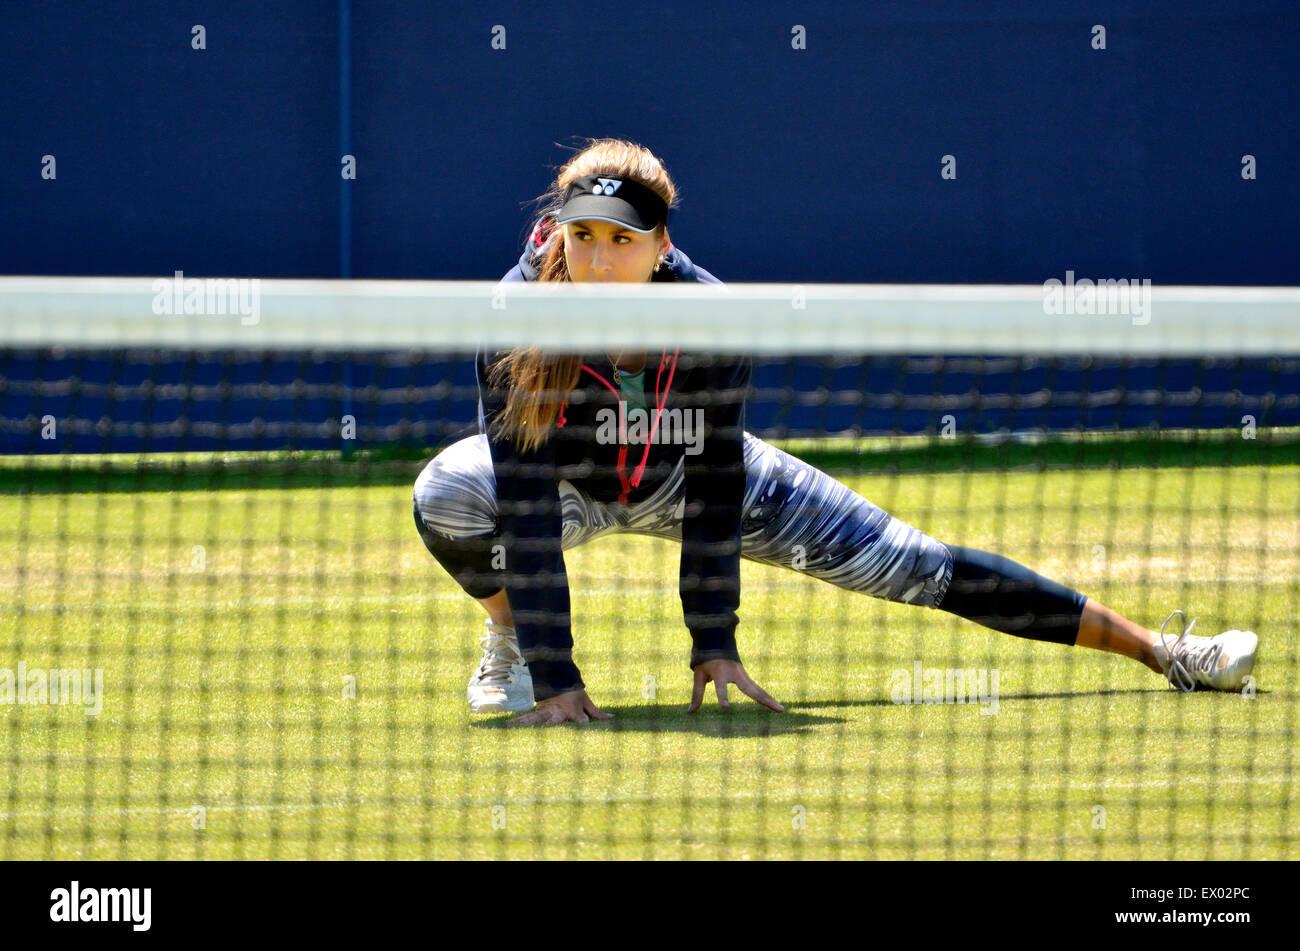 Belinda Bencic (Schweiz) Training vor dem Finale bei den Aegon International, Eastbourne, 24. Juni 2015 Stockbild